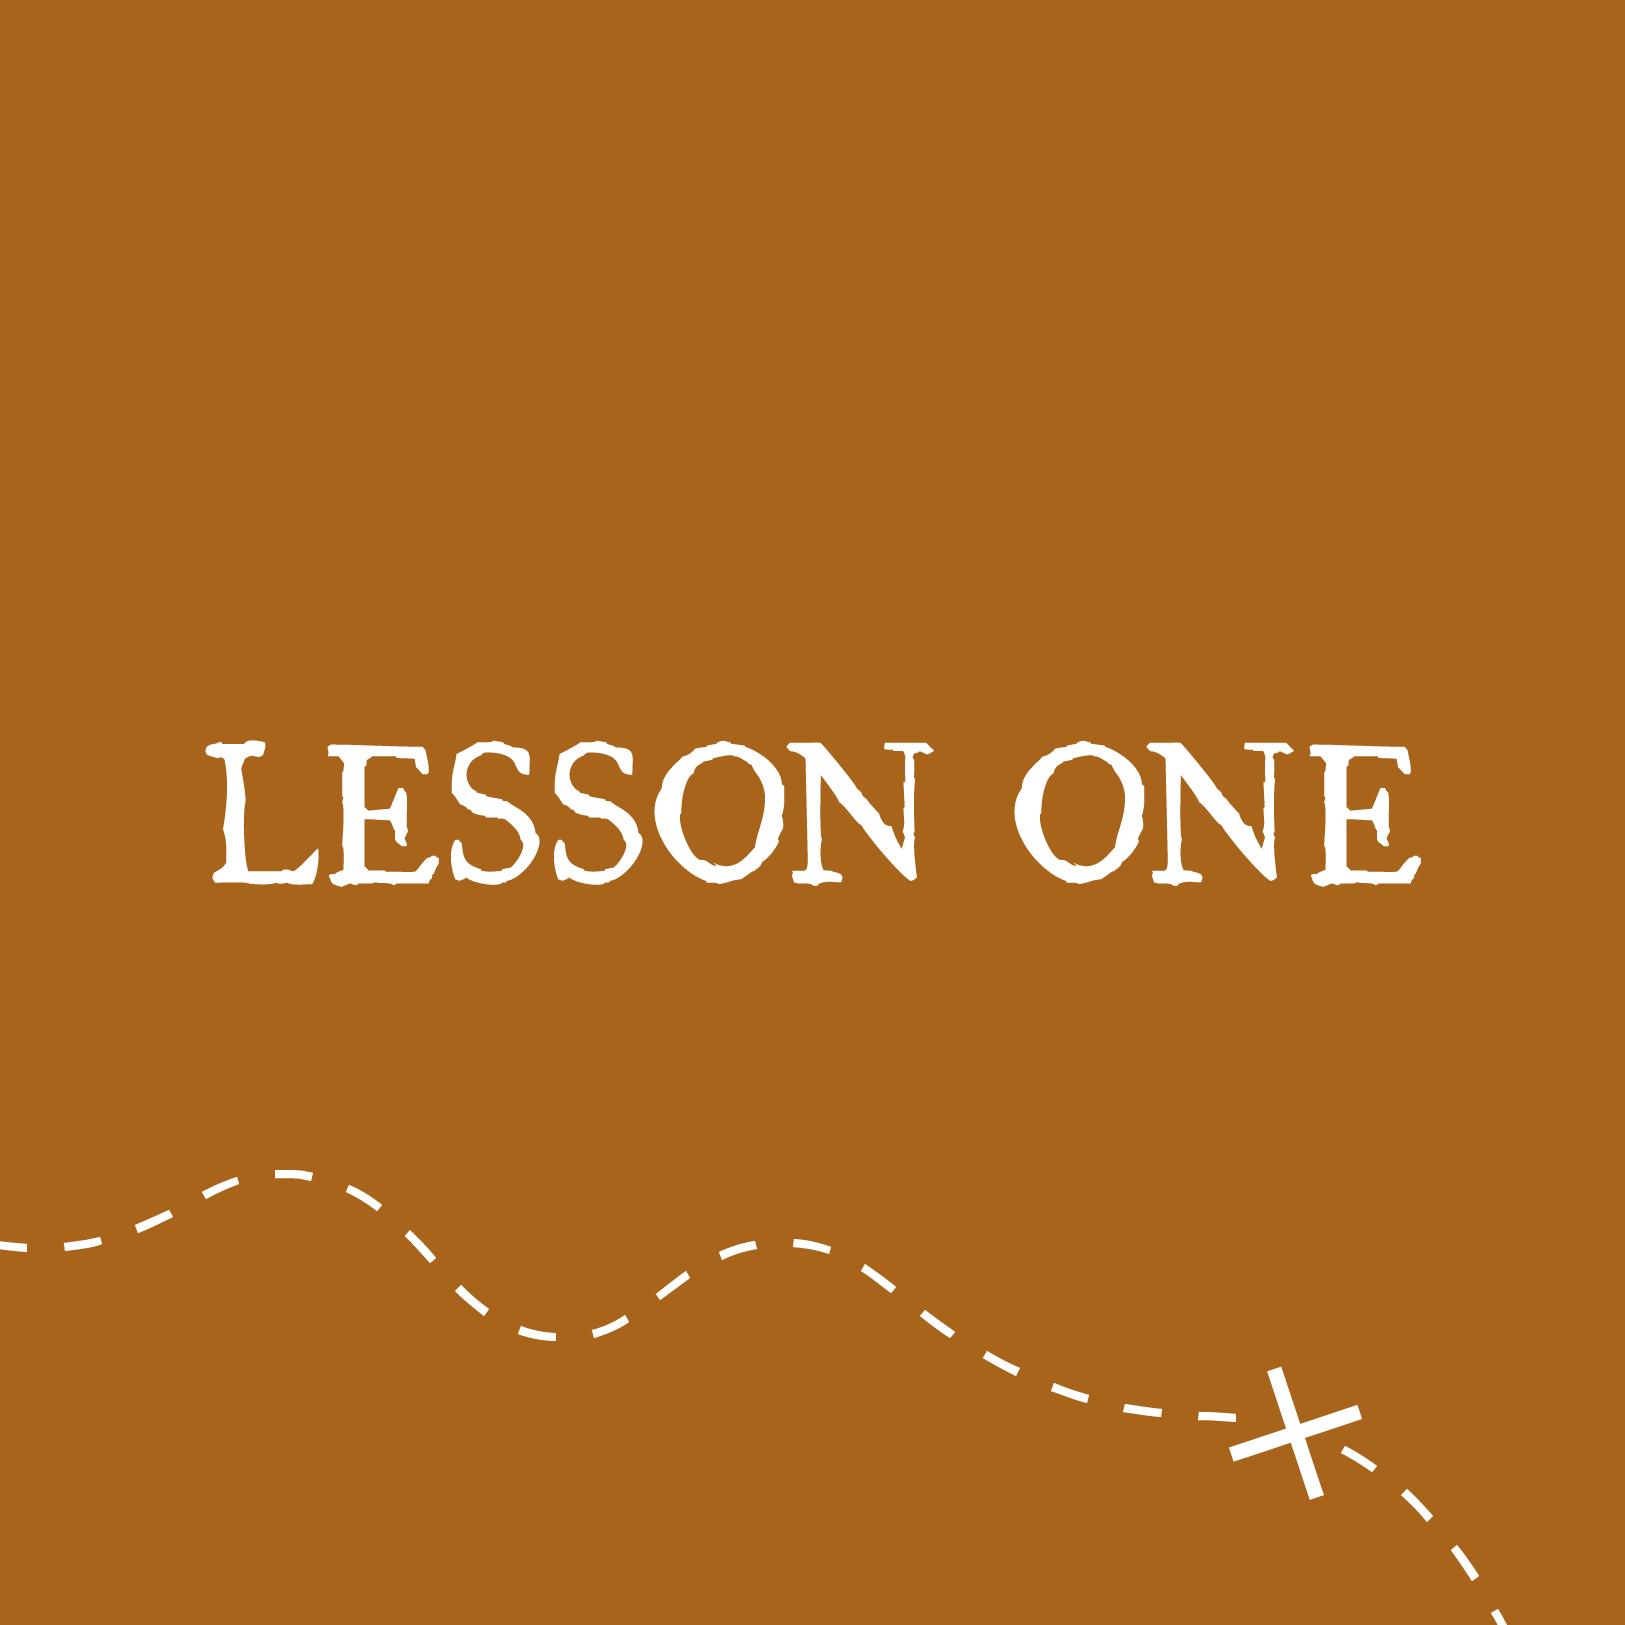 VBS Lesson 1